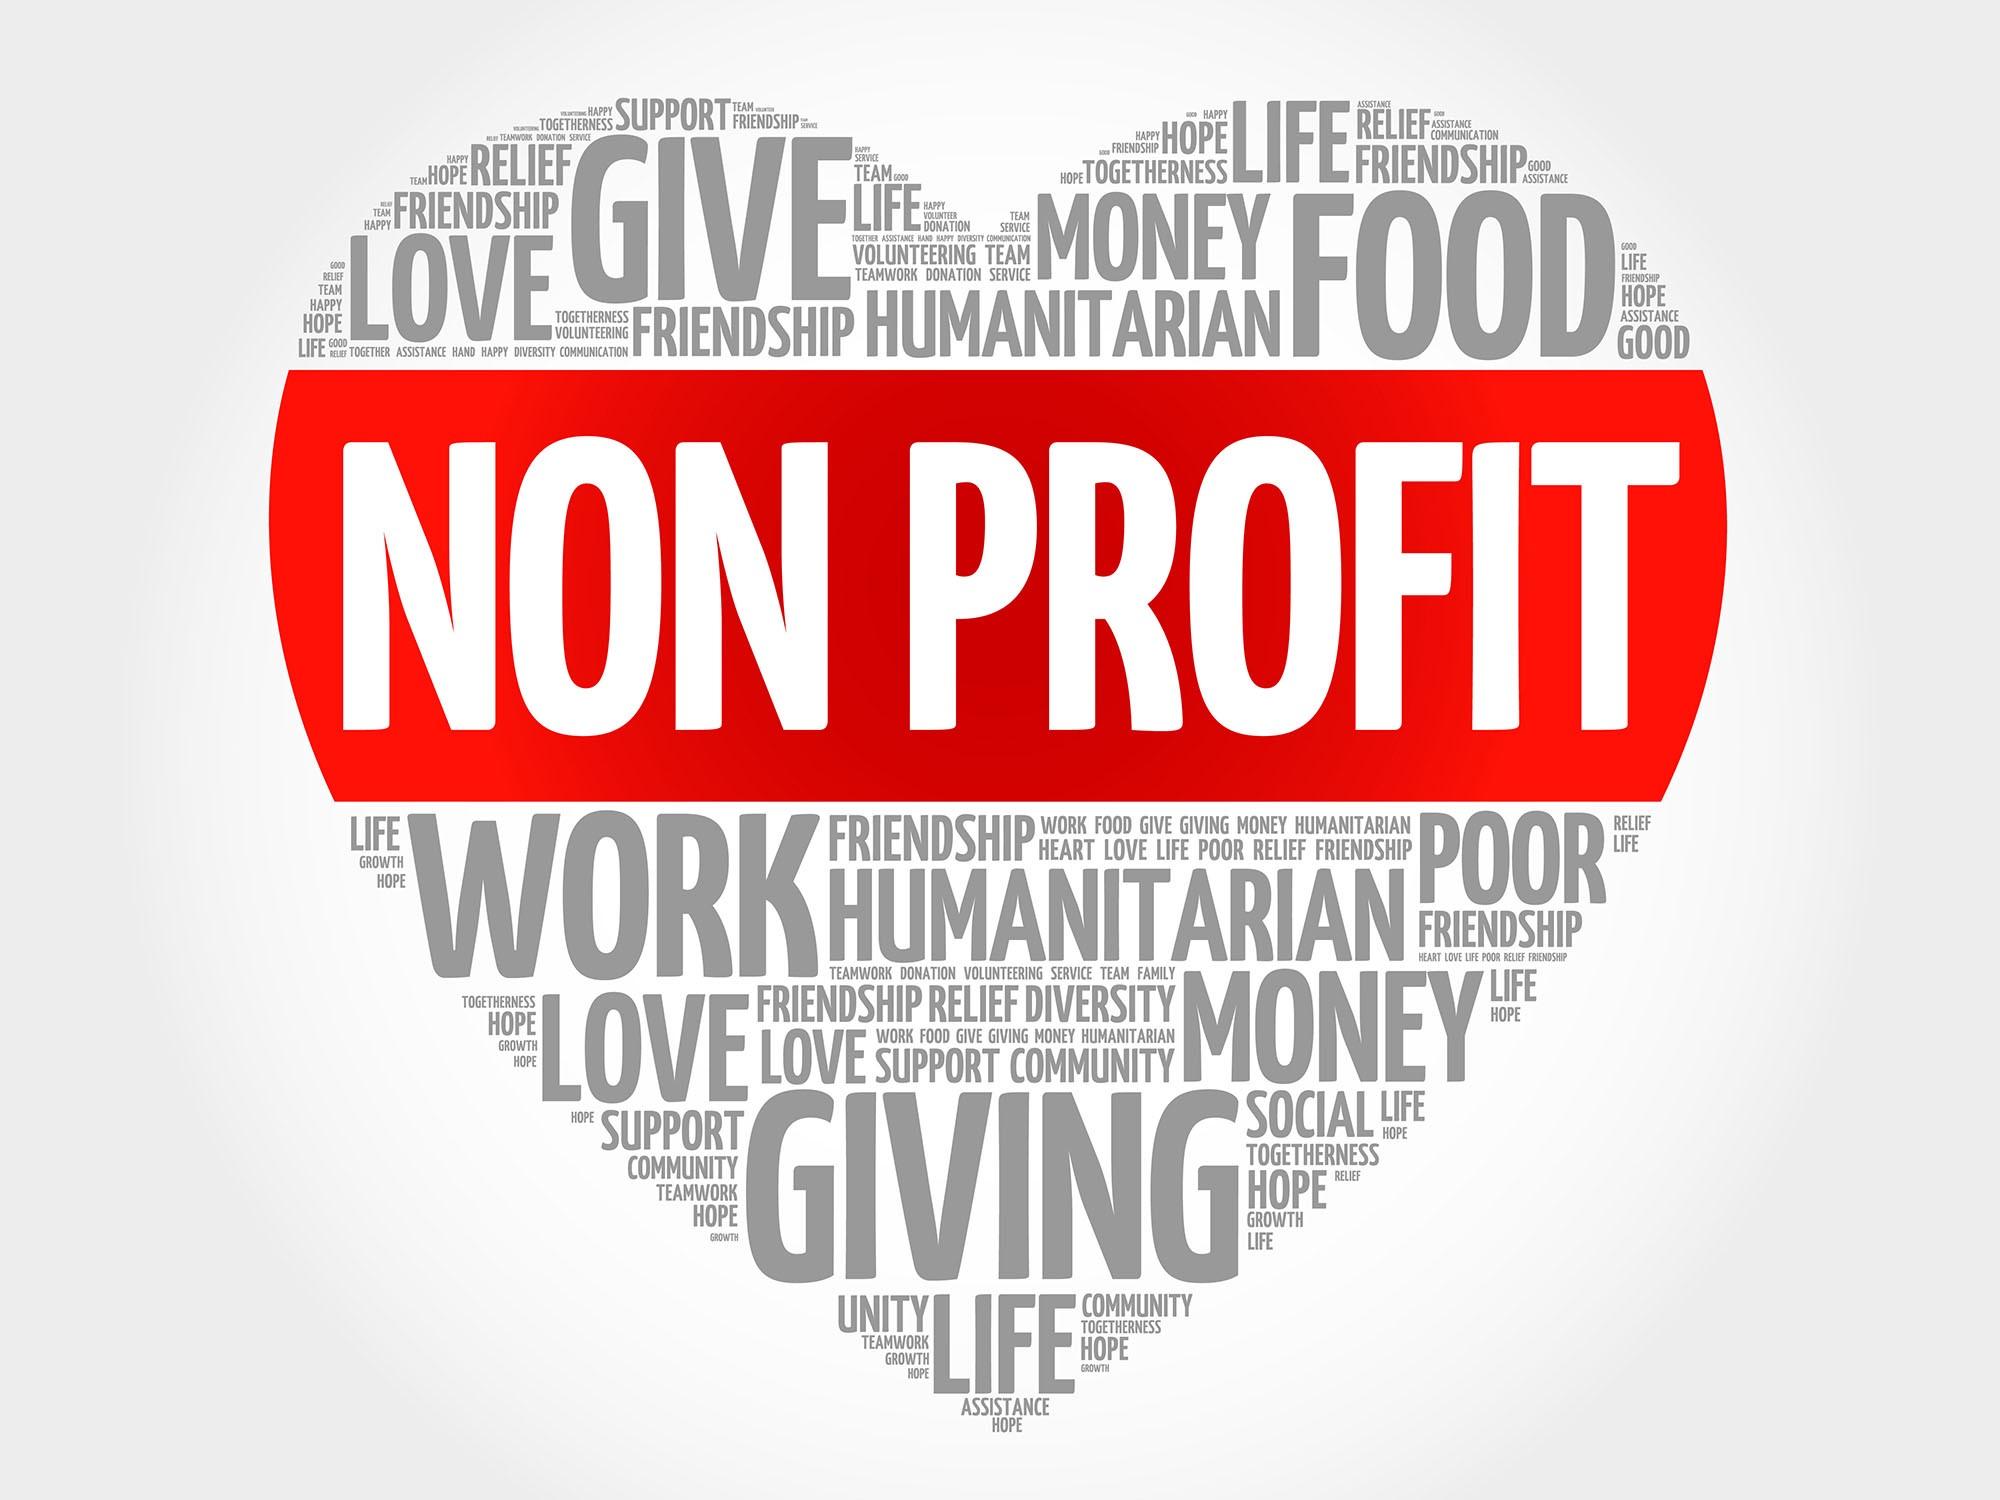 The Best Kept Financial Secret for Non-Profit Organizations   by Ryan  Griggs   Medium